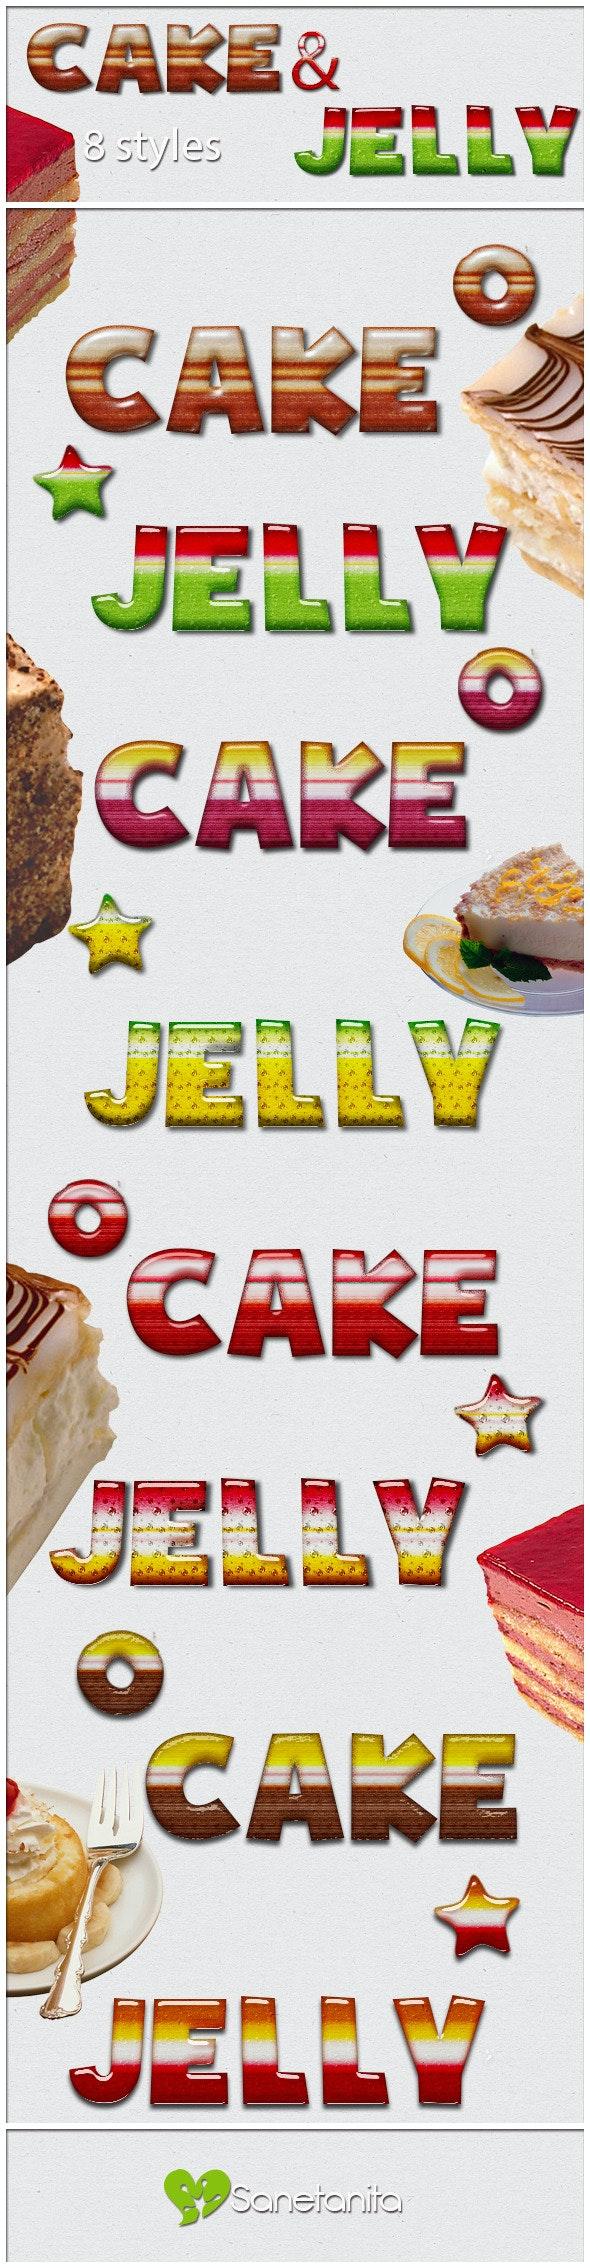 8 Dessert Styles - Text Effects Styles